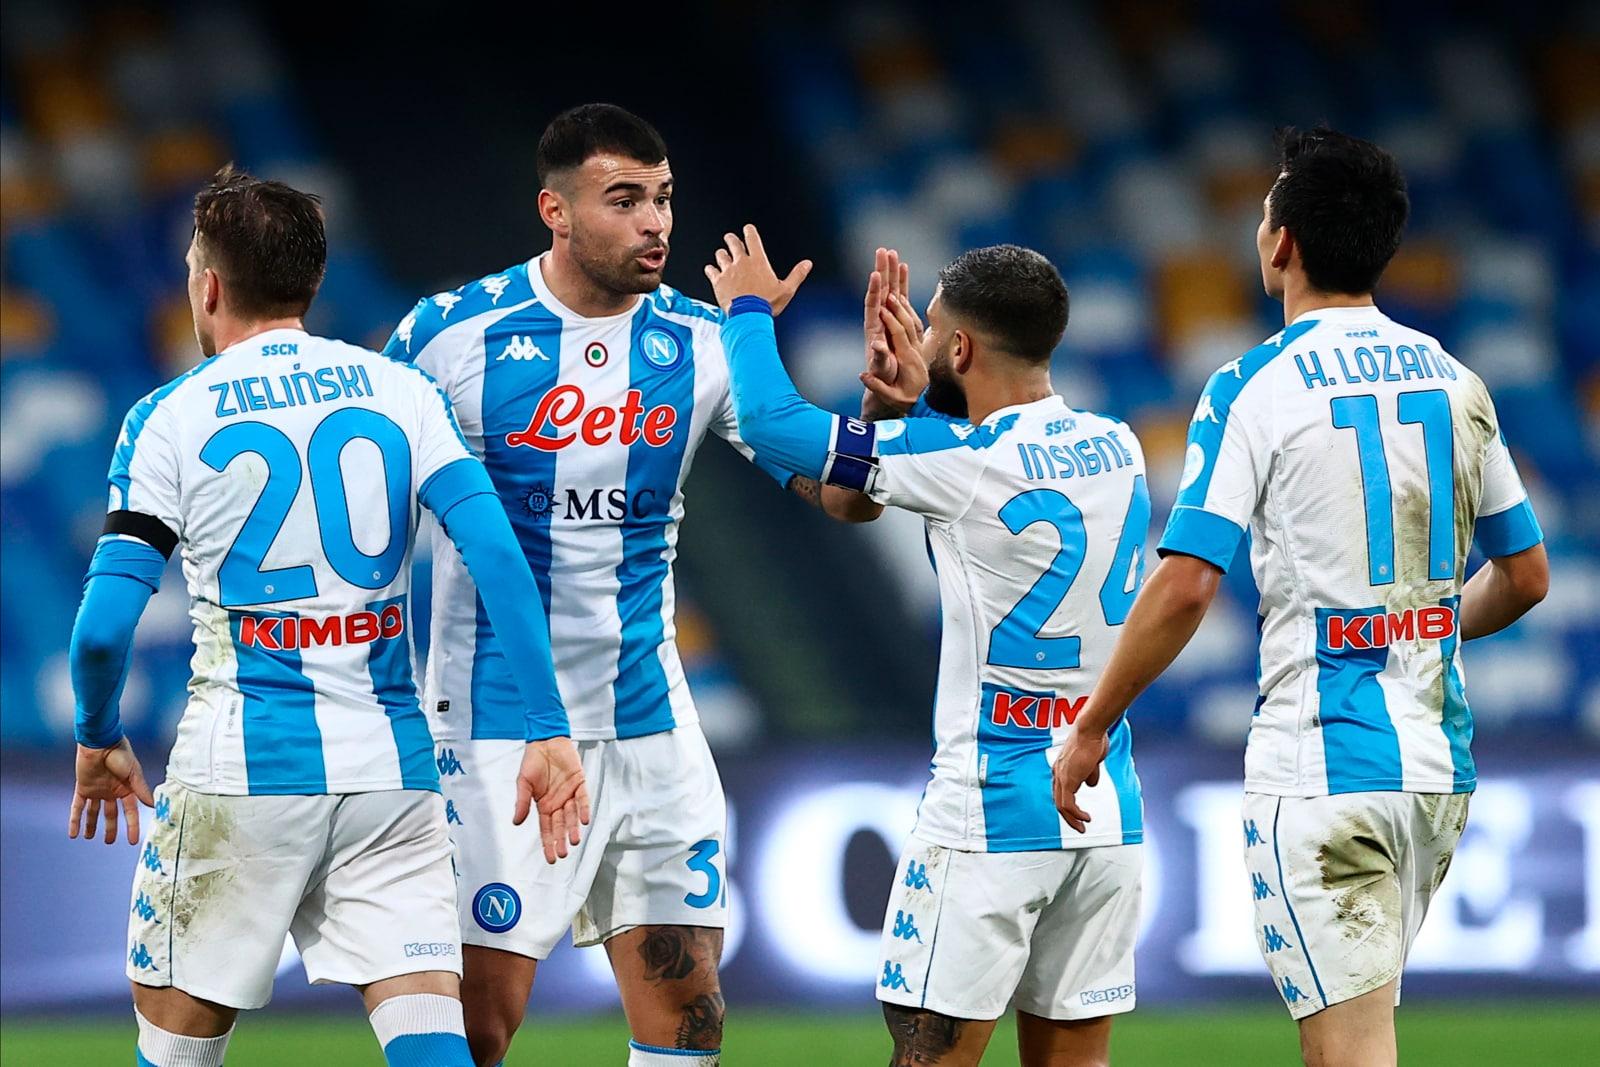 Lozano e Petagna ribaltano la Sampdoria: festa Napoli al Maradona